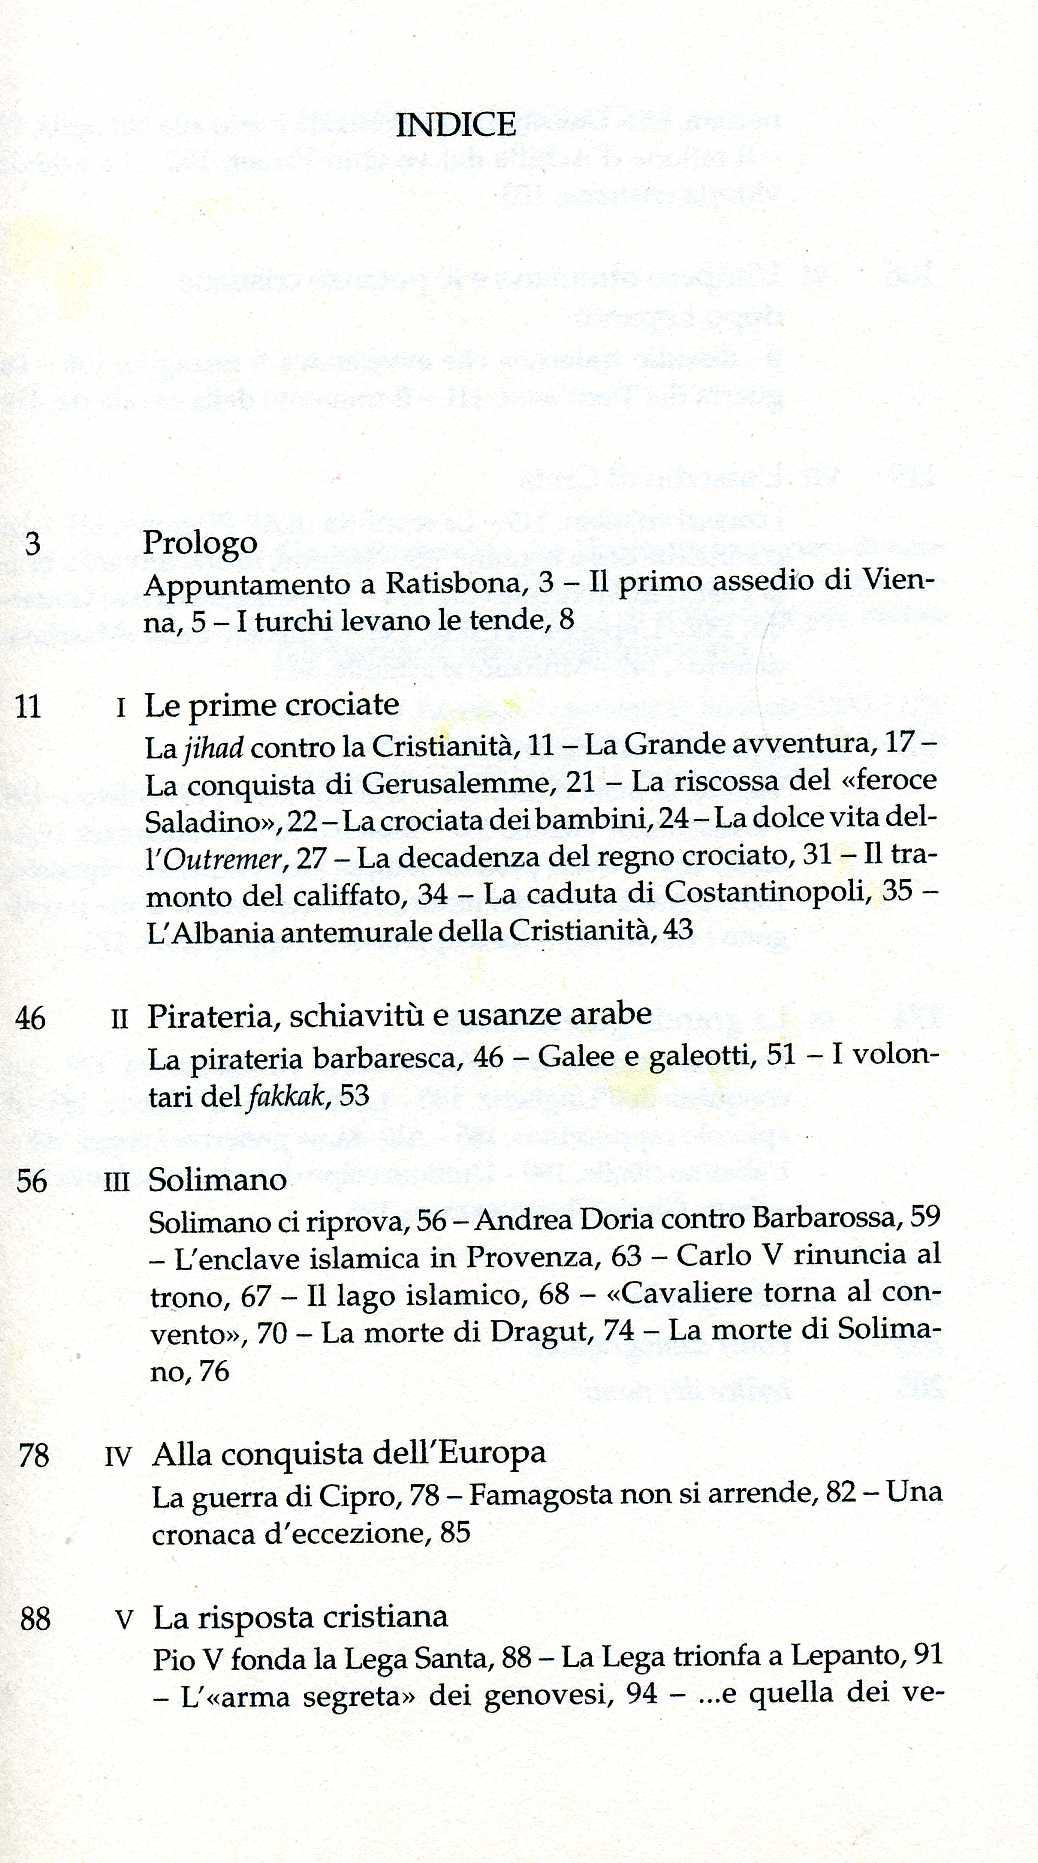 petacco2794